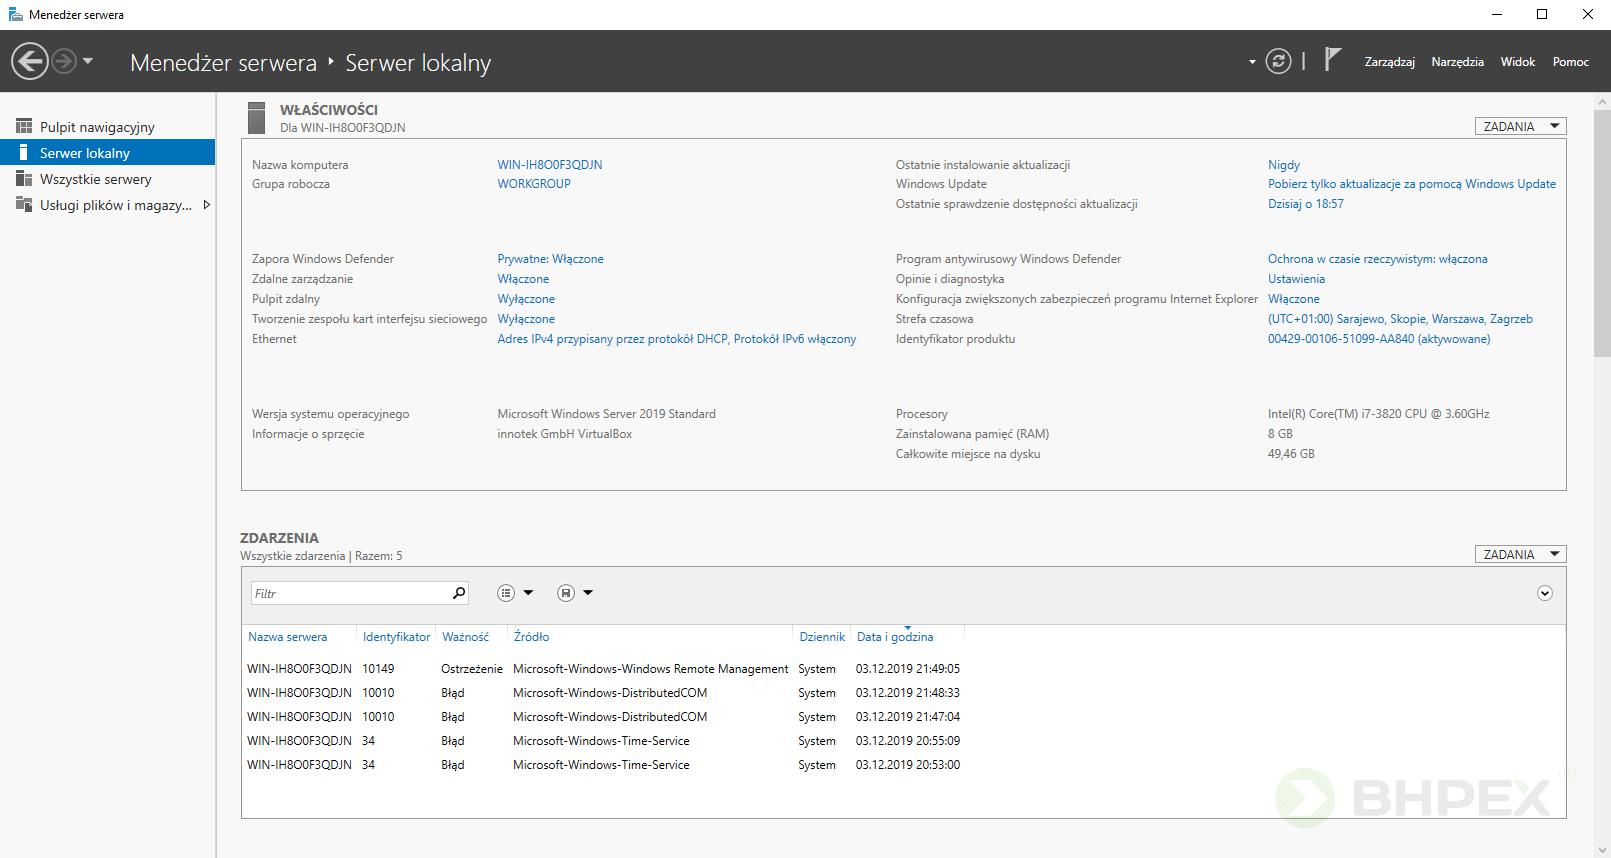 Serwer lokalny -menedżer serwera